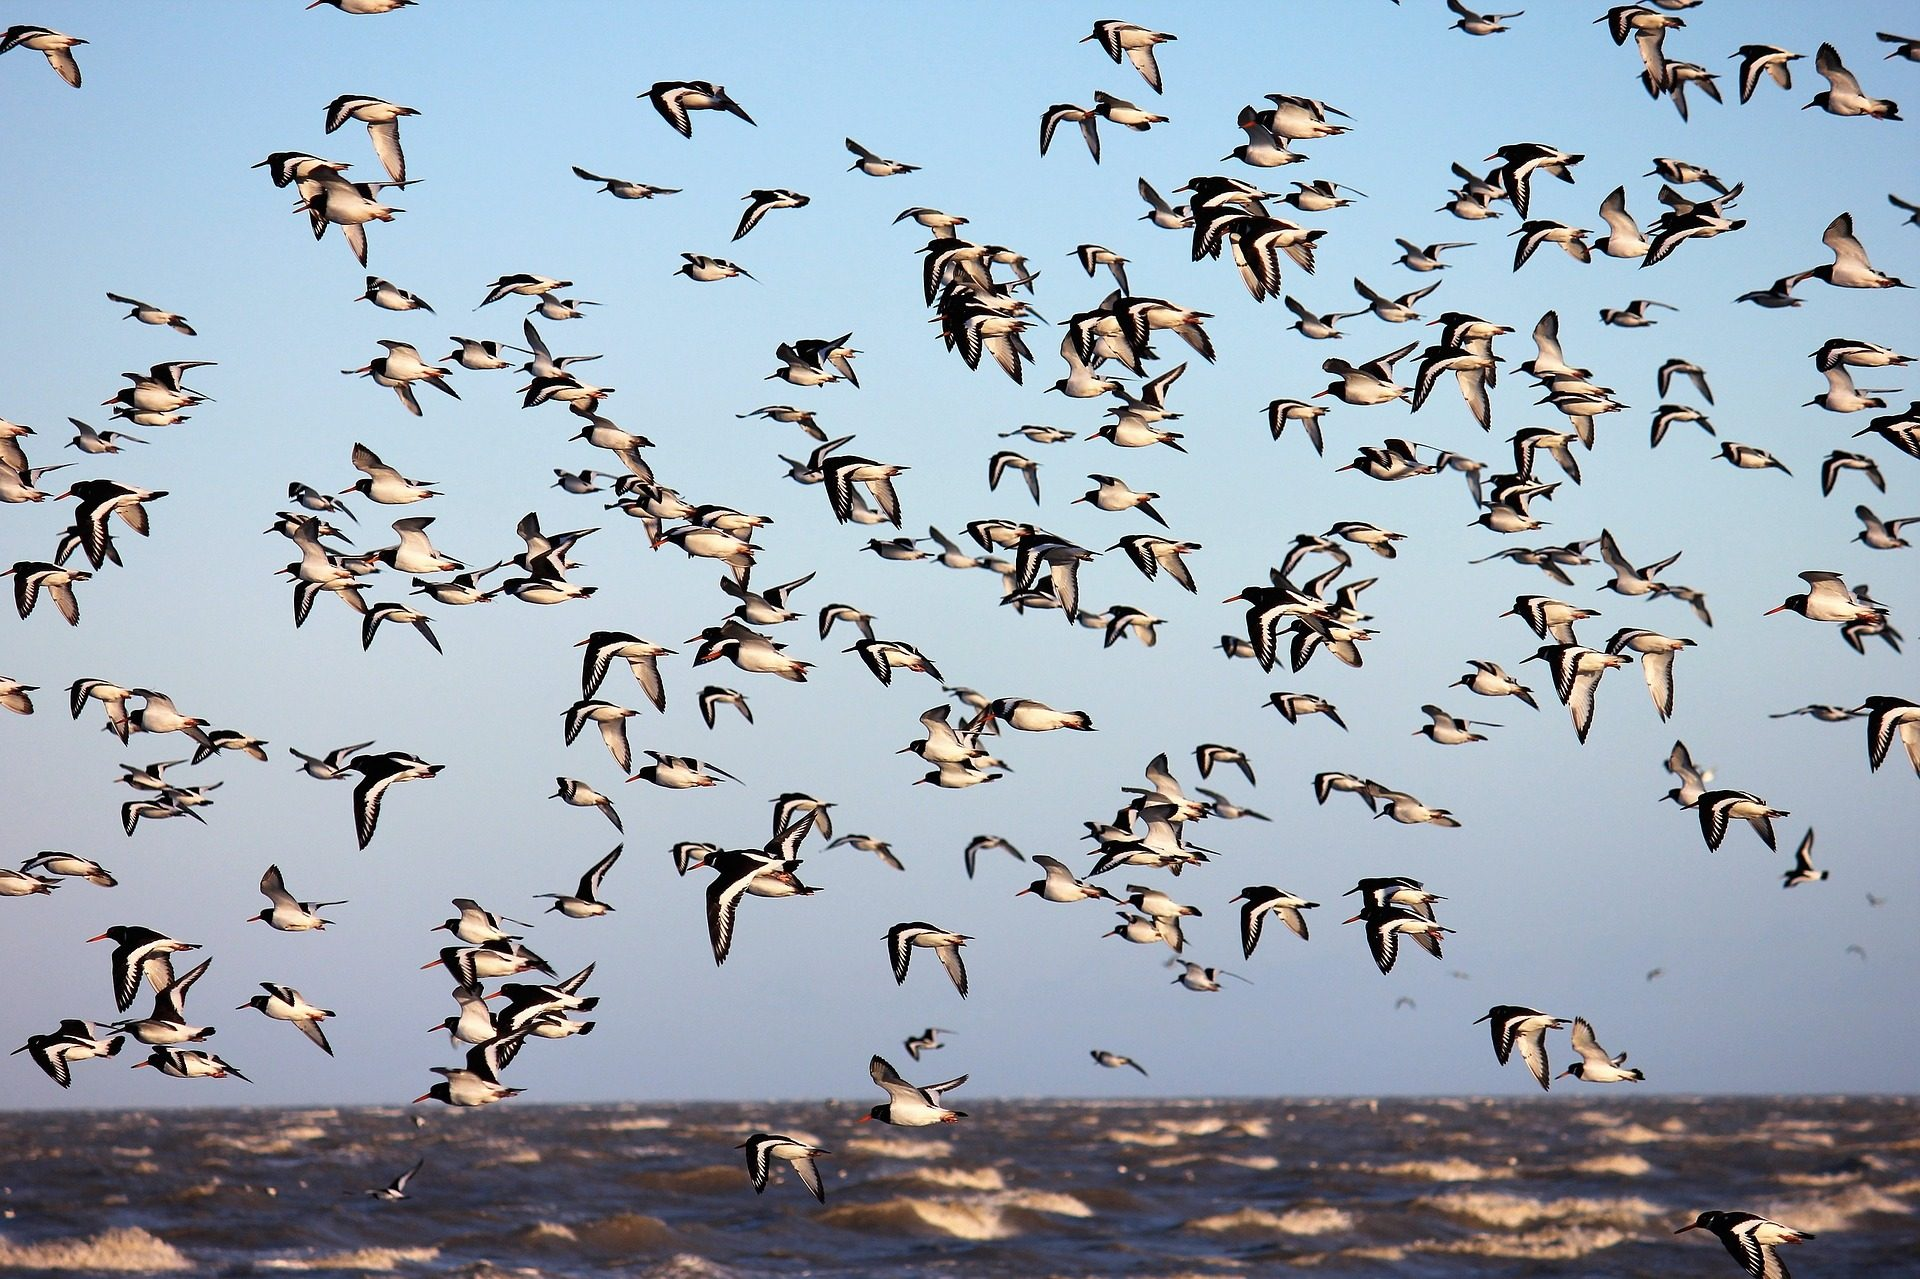 pájaros, قطيع,الطيورs, الكمية, البحر - خلفيات عالية الدقة - أستاذ falken.com